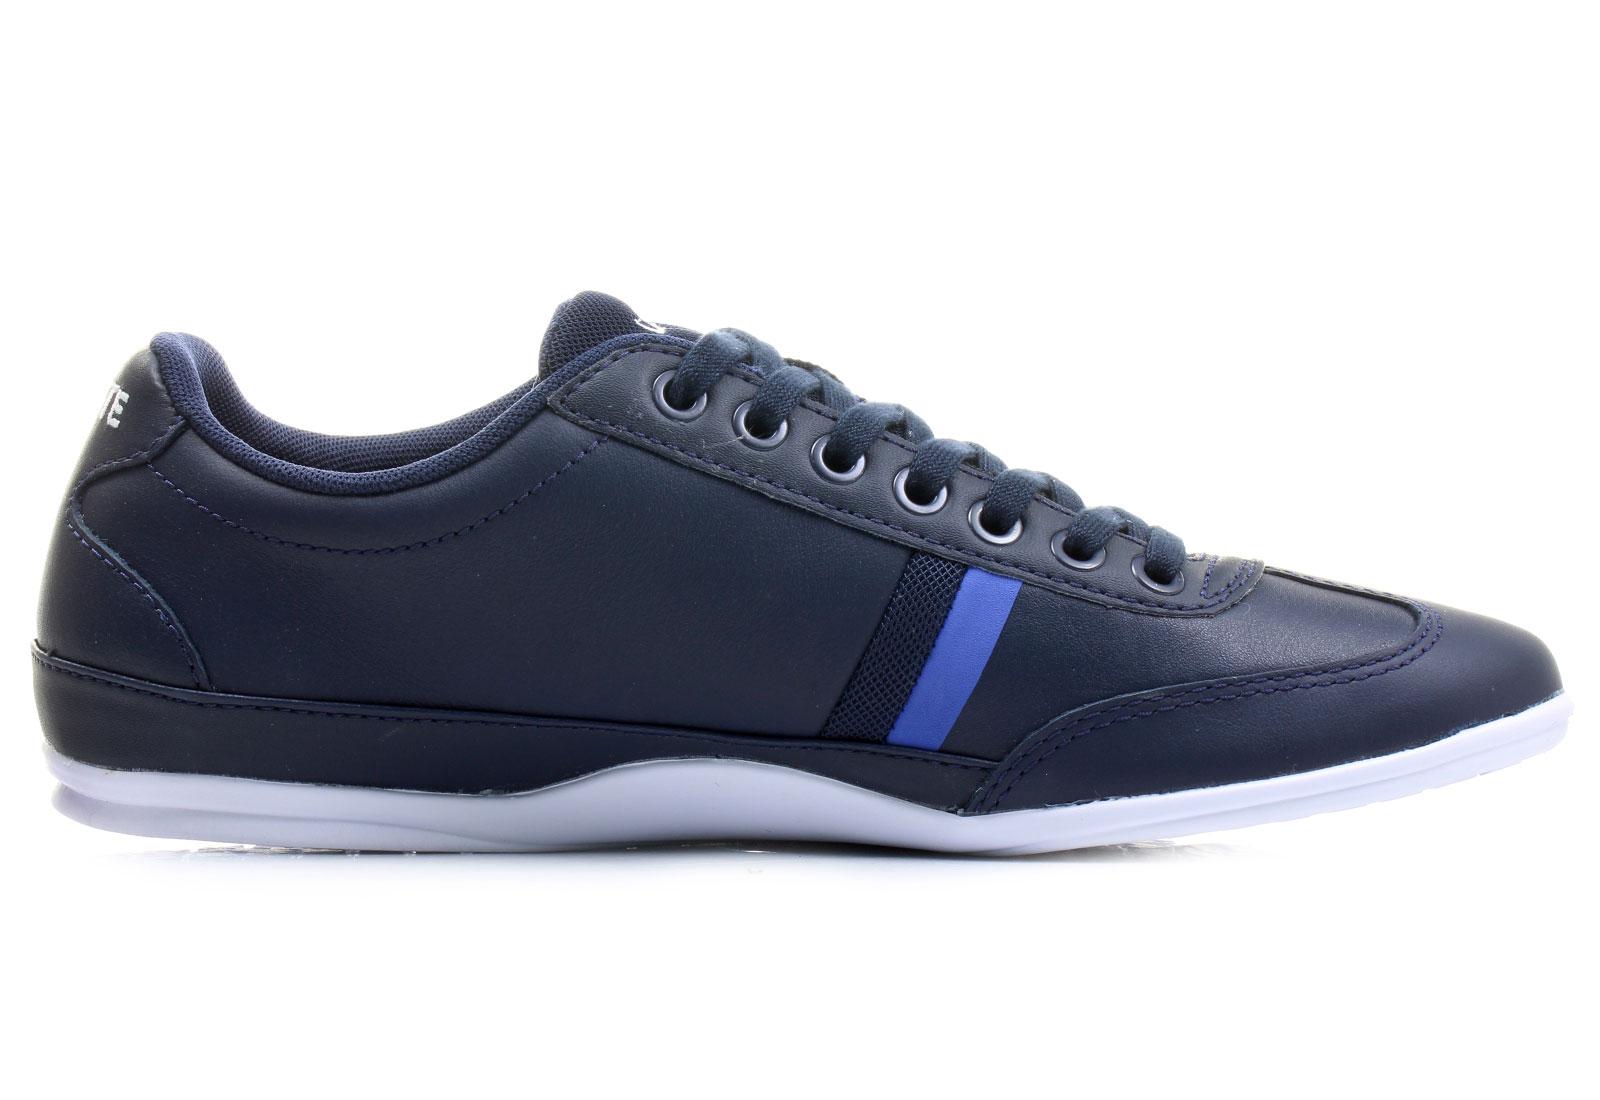 lacoste shoes misano sport 161spm0030 003